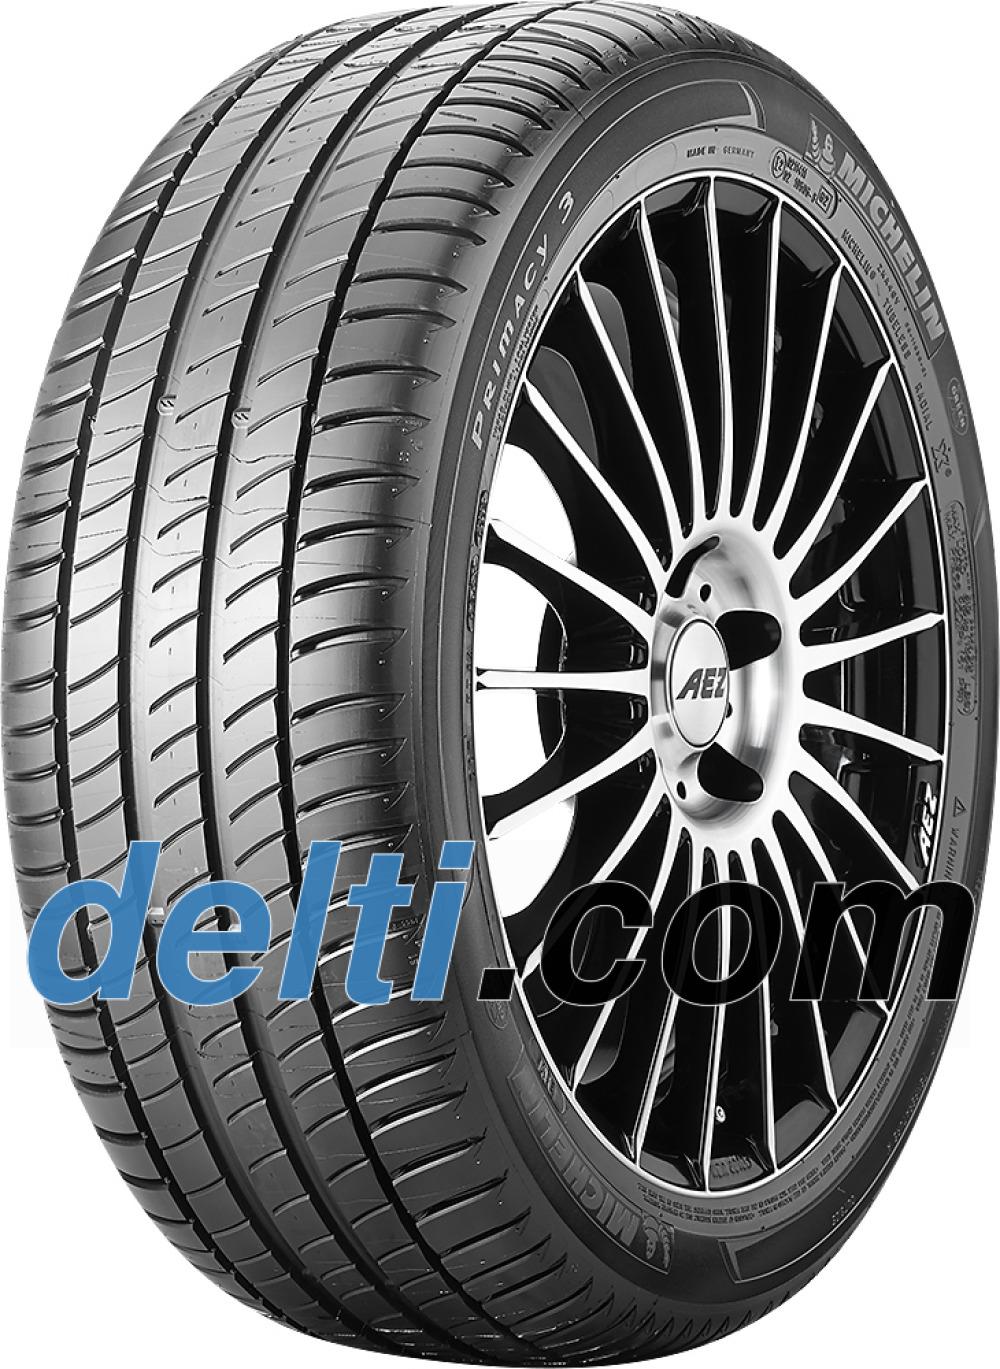 Michelin Primacy 3 ZP ( 275/40 R19 101Y runflat, *, with rim protection ridge (FSL) )